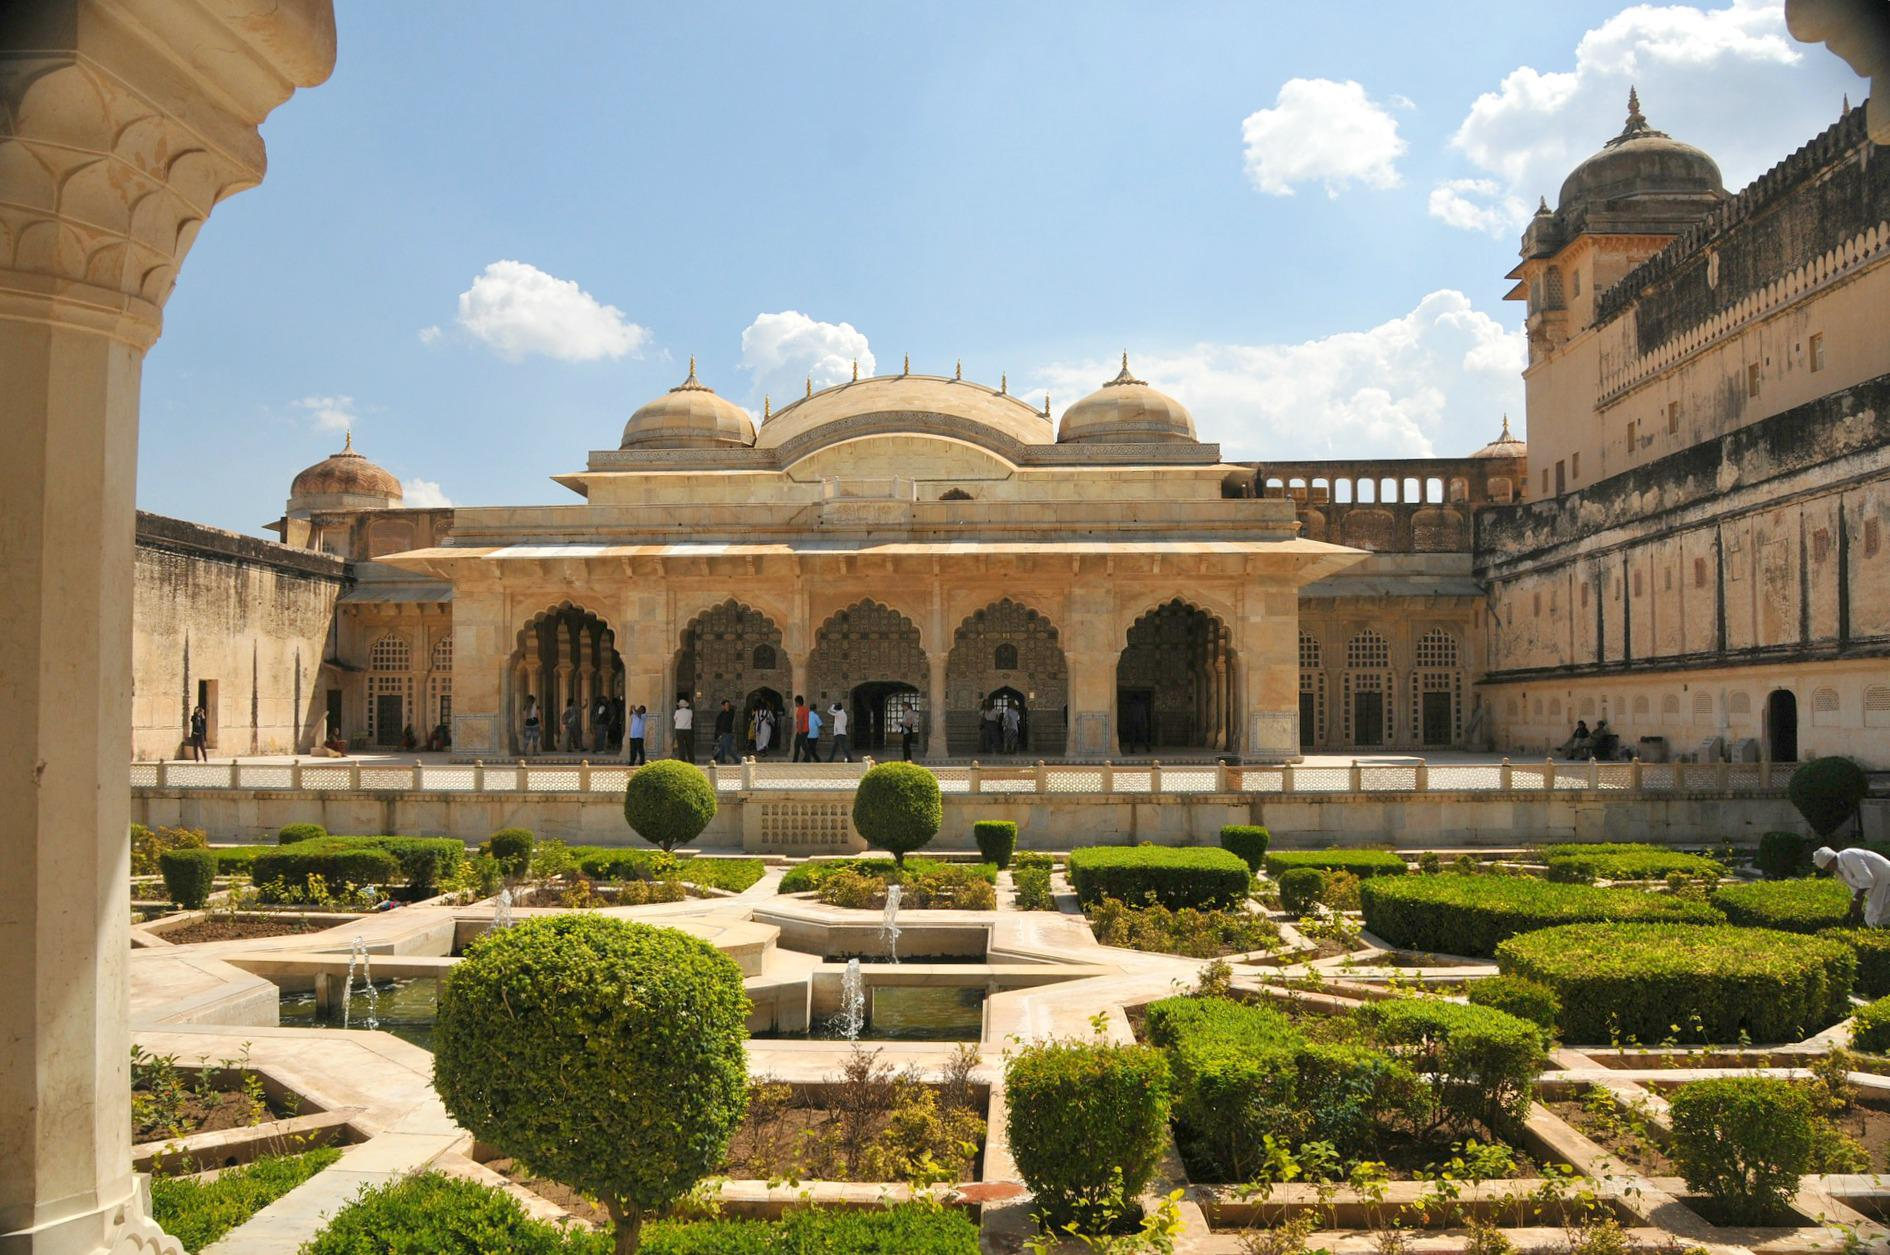 jaipur-highlights-amber-fort-india